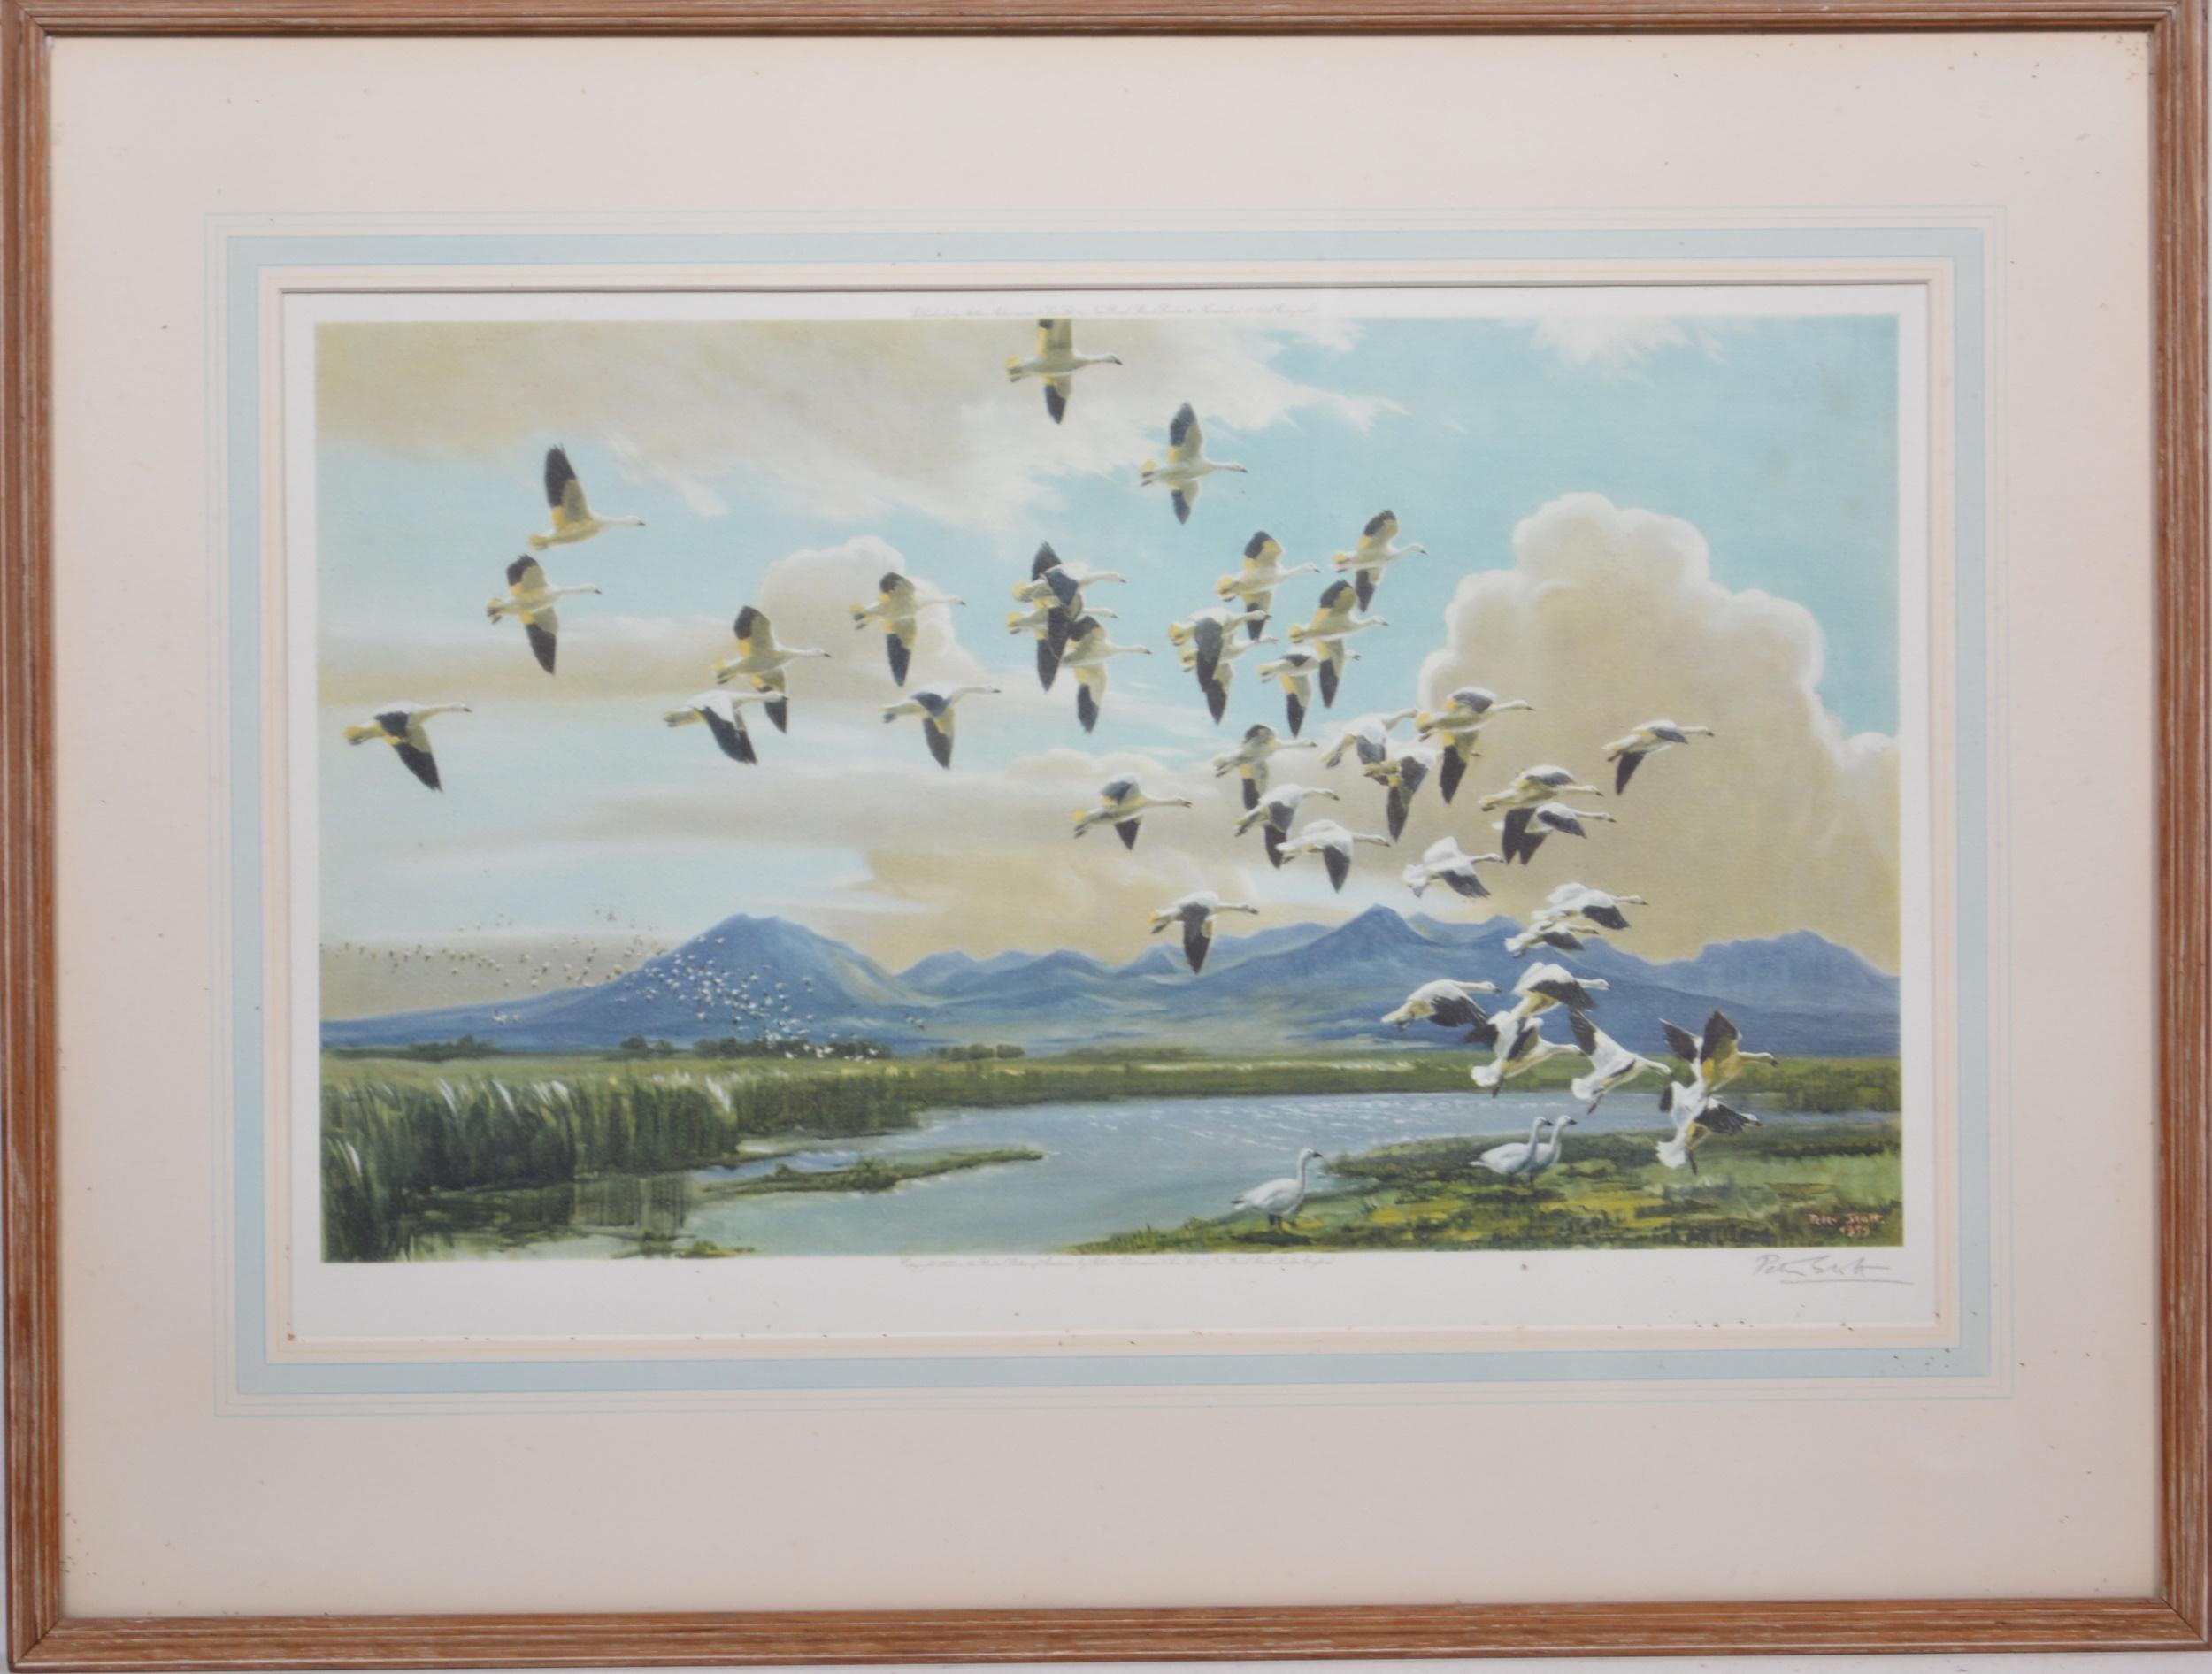 Peter Scott, Snow geese in California, - Image 2 of 4